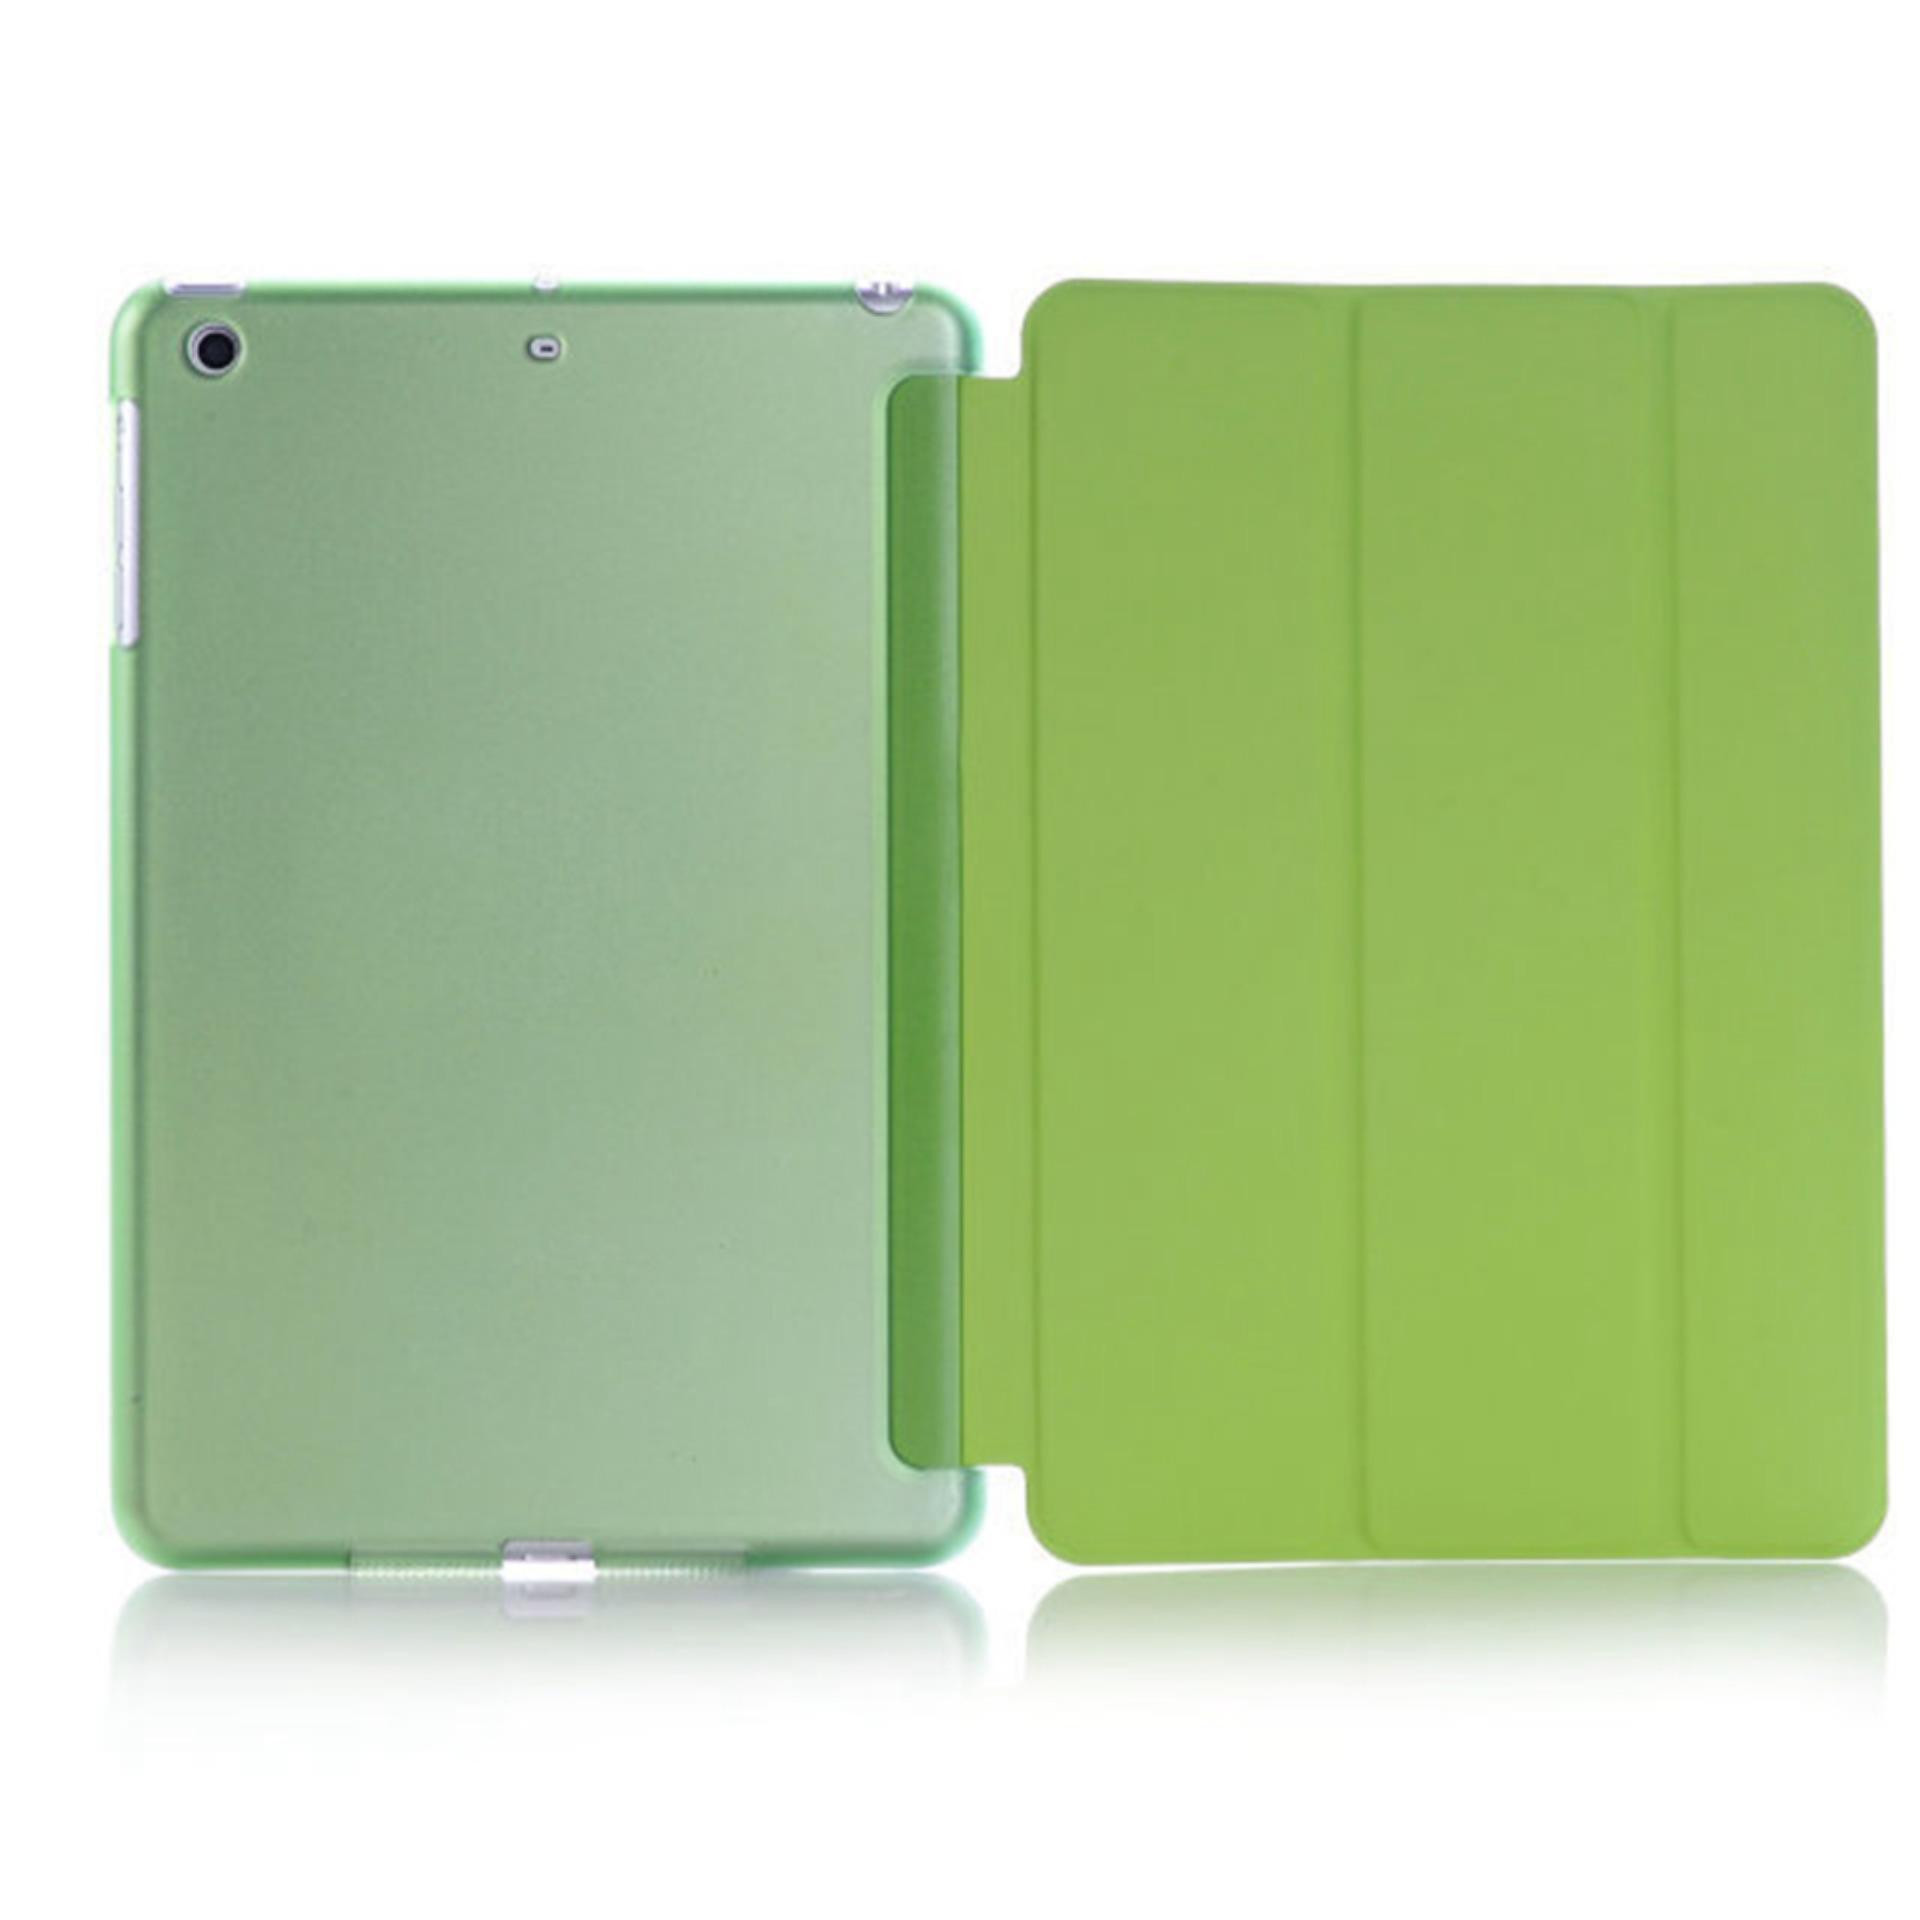 ... MINI1 2 3 INTERNATIONAL ... Moonar intelektual dormansi ultra-tipis 3 kali lipat Case kulit untuk iPad .